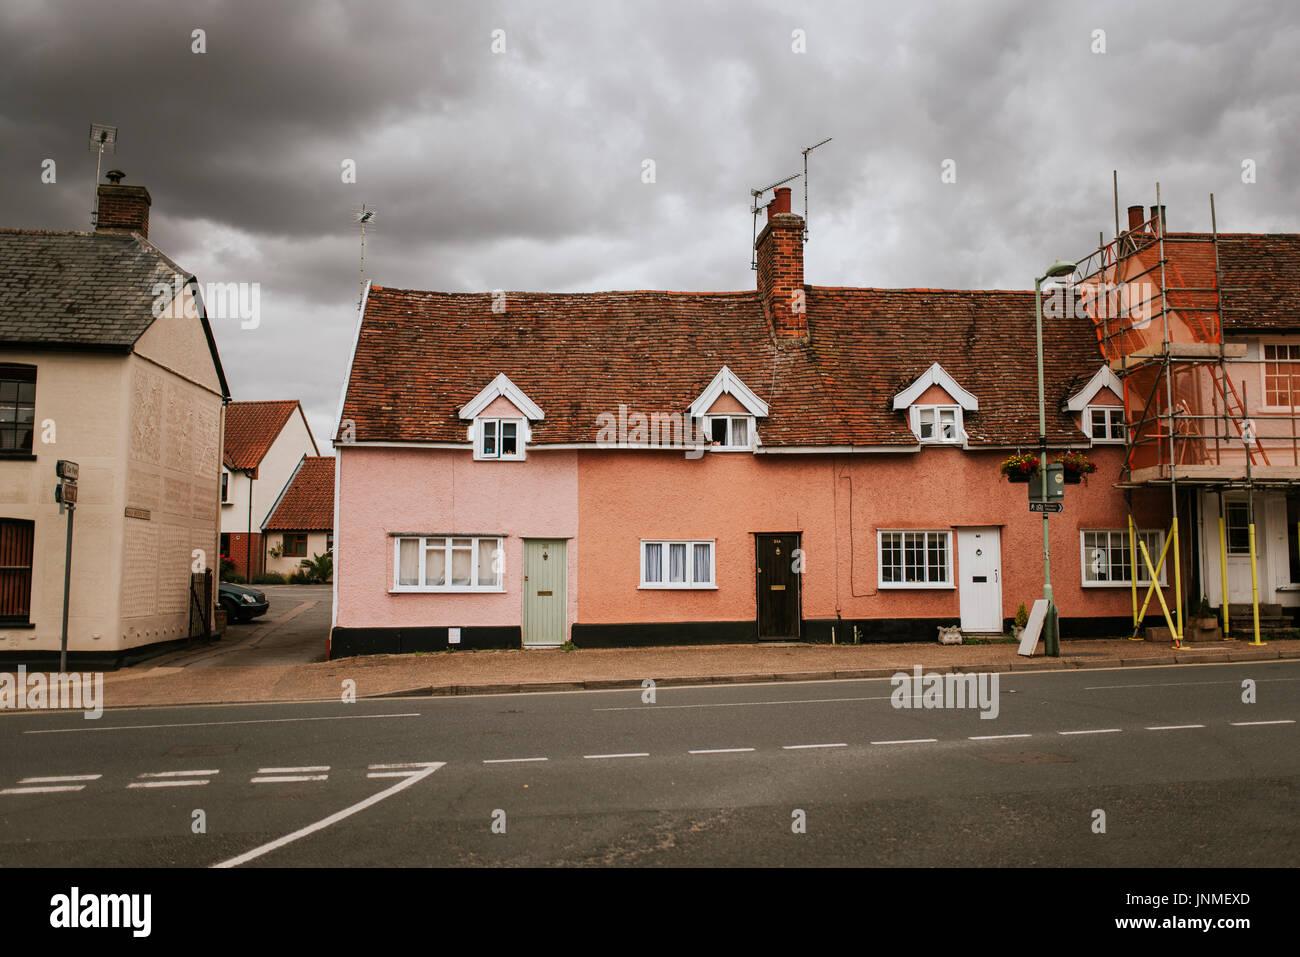 Street detail in Lavenham, England - Stock Image